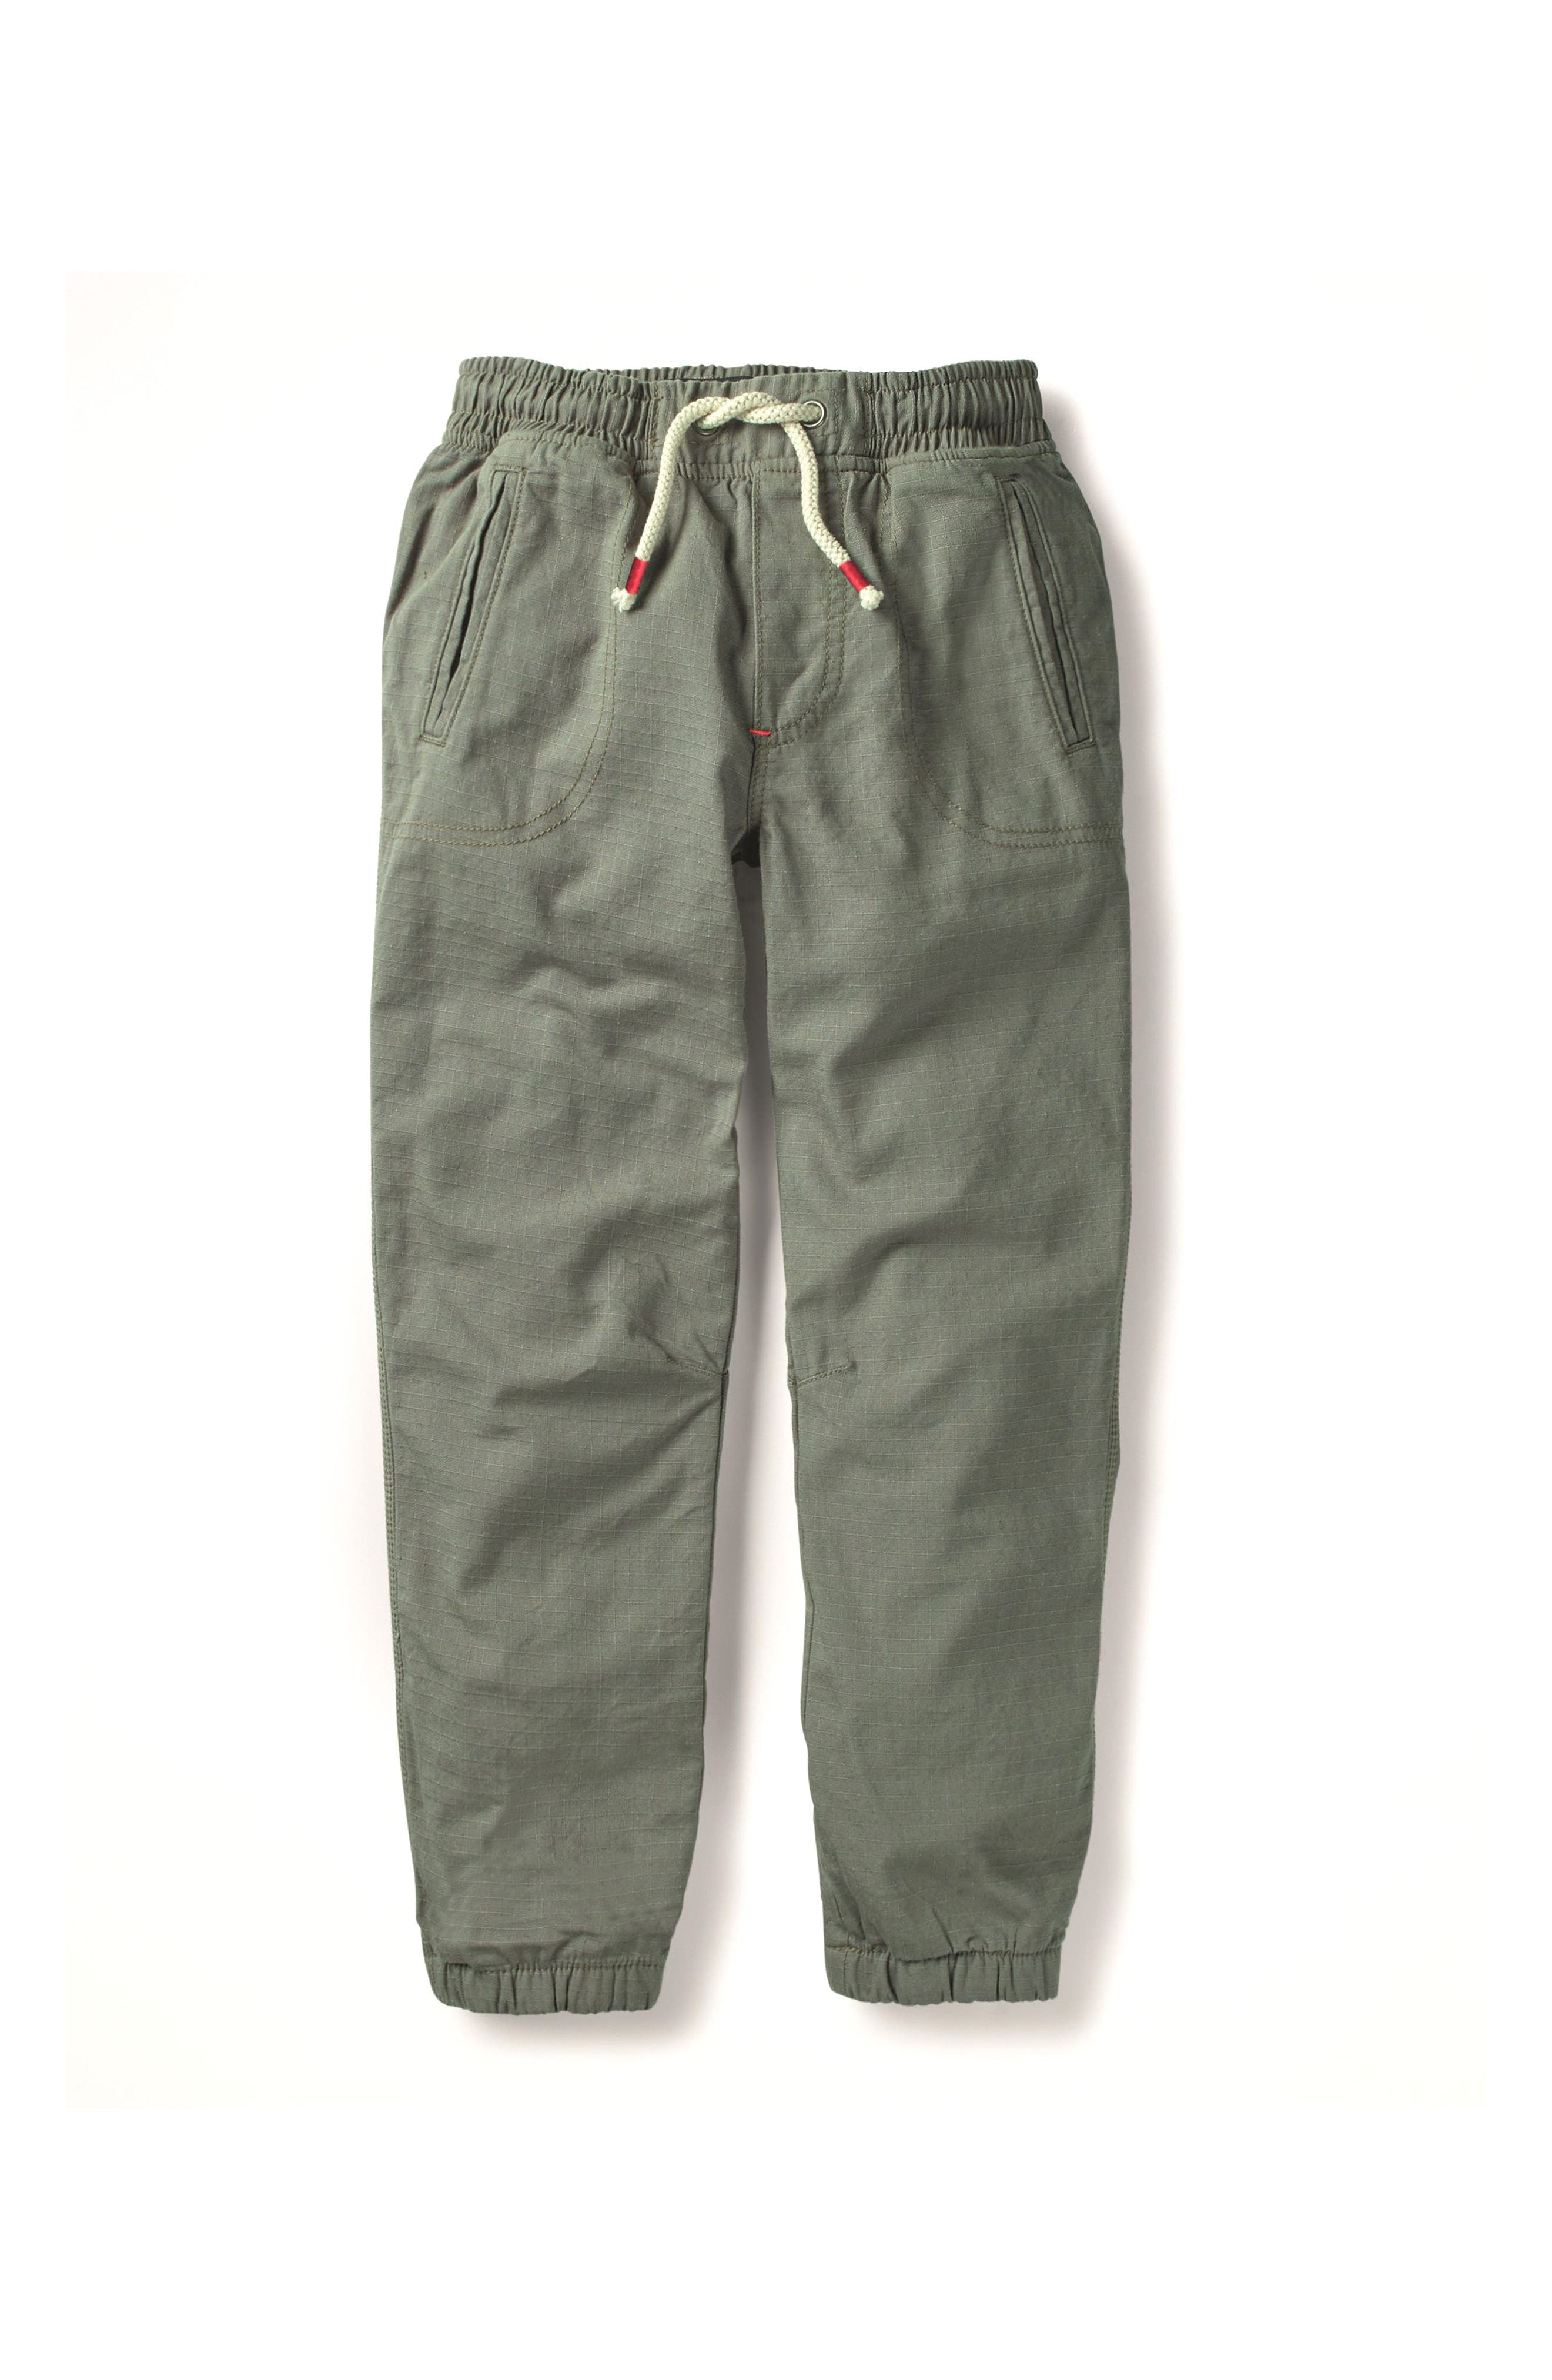 Lined Sweatpants,                             Main thumbnail 1, color,                             Shrub Green